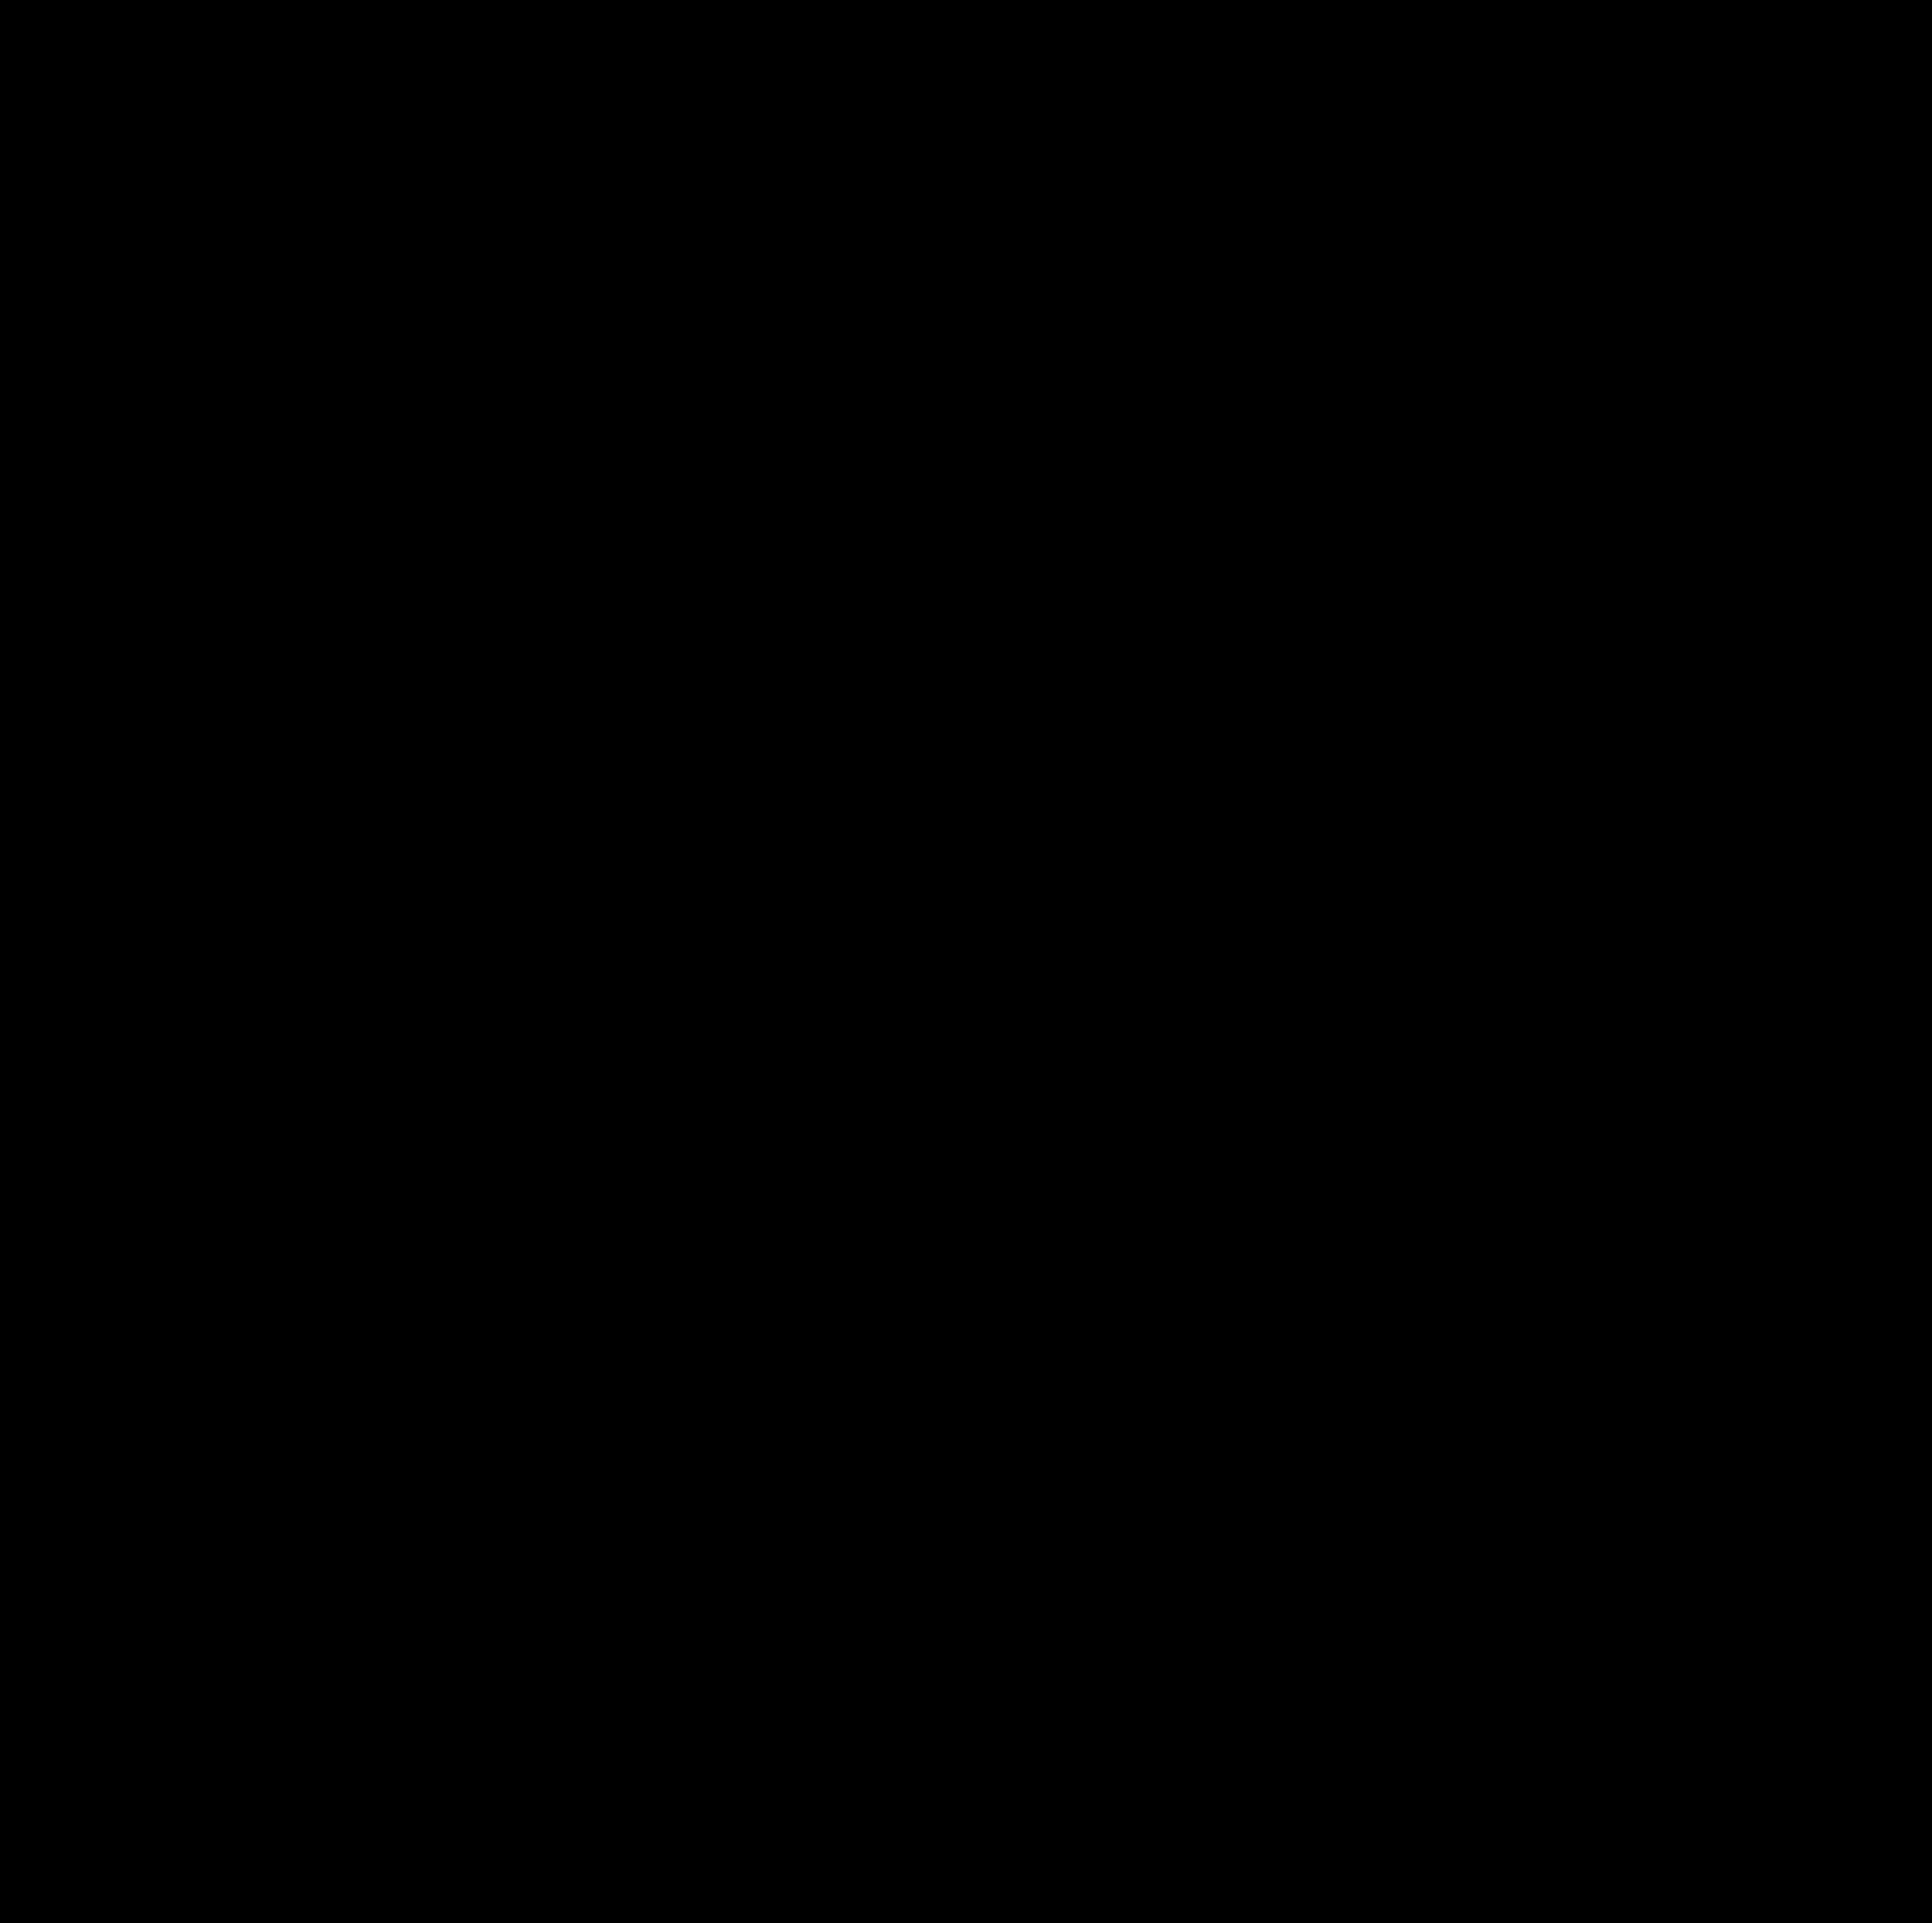 SAMURI PHOTO & DESCRIPTION UPLOADER    - SAMURI MOTOR COMPANY